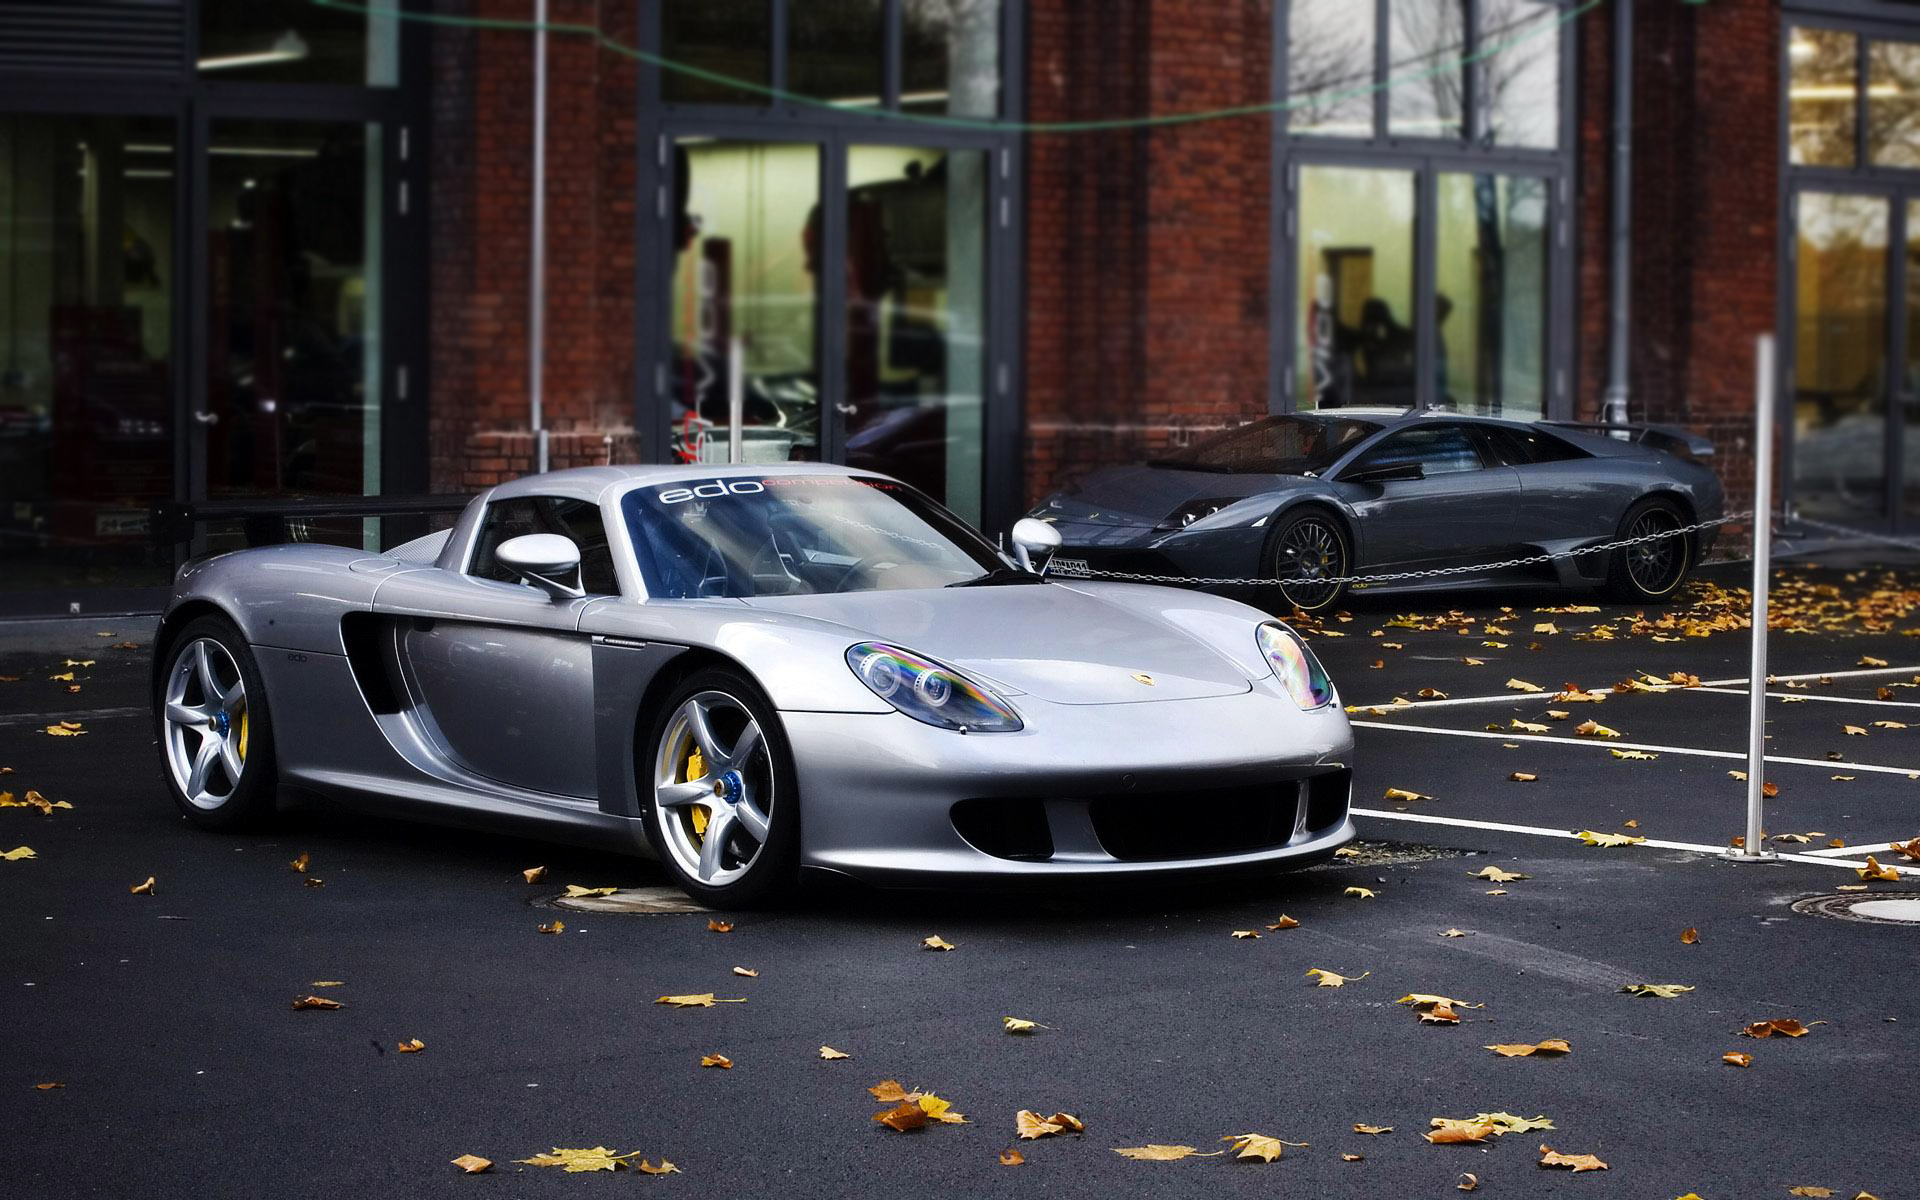 33 Porsche Carrera Gt Wallpapers On Wallpapersafari